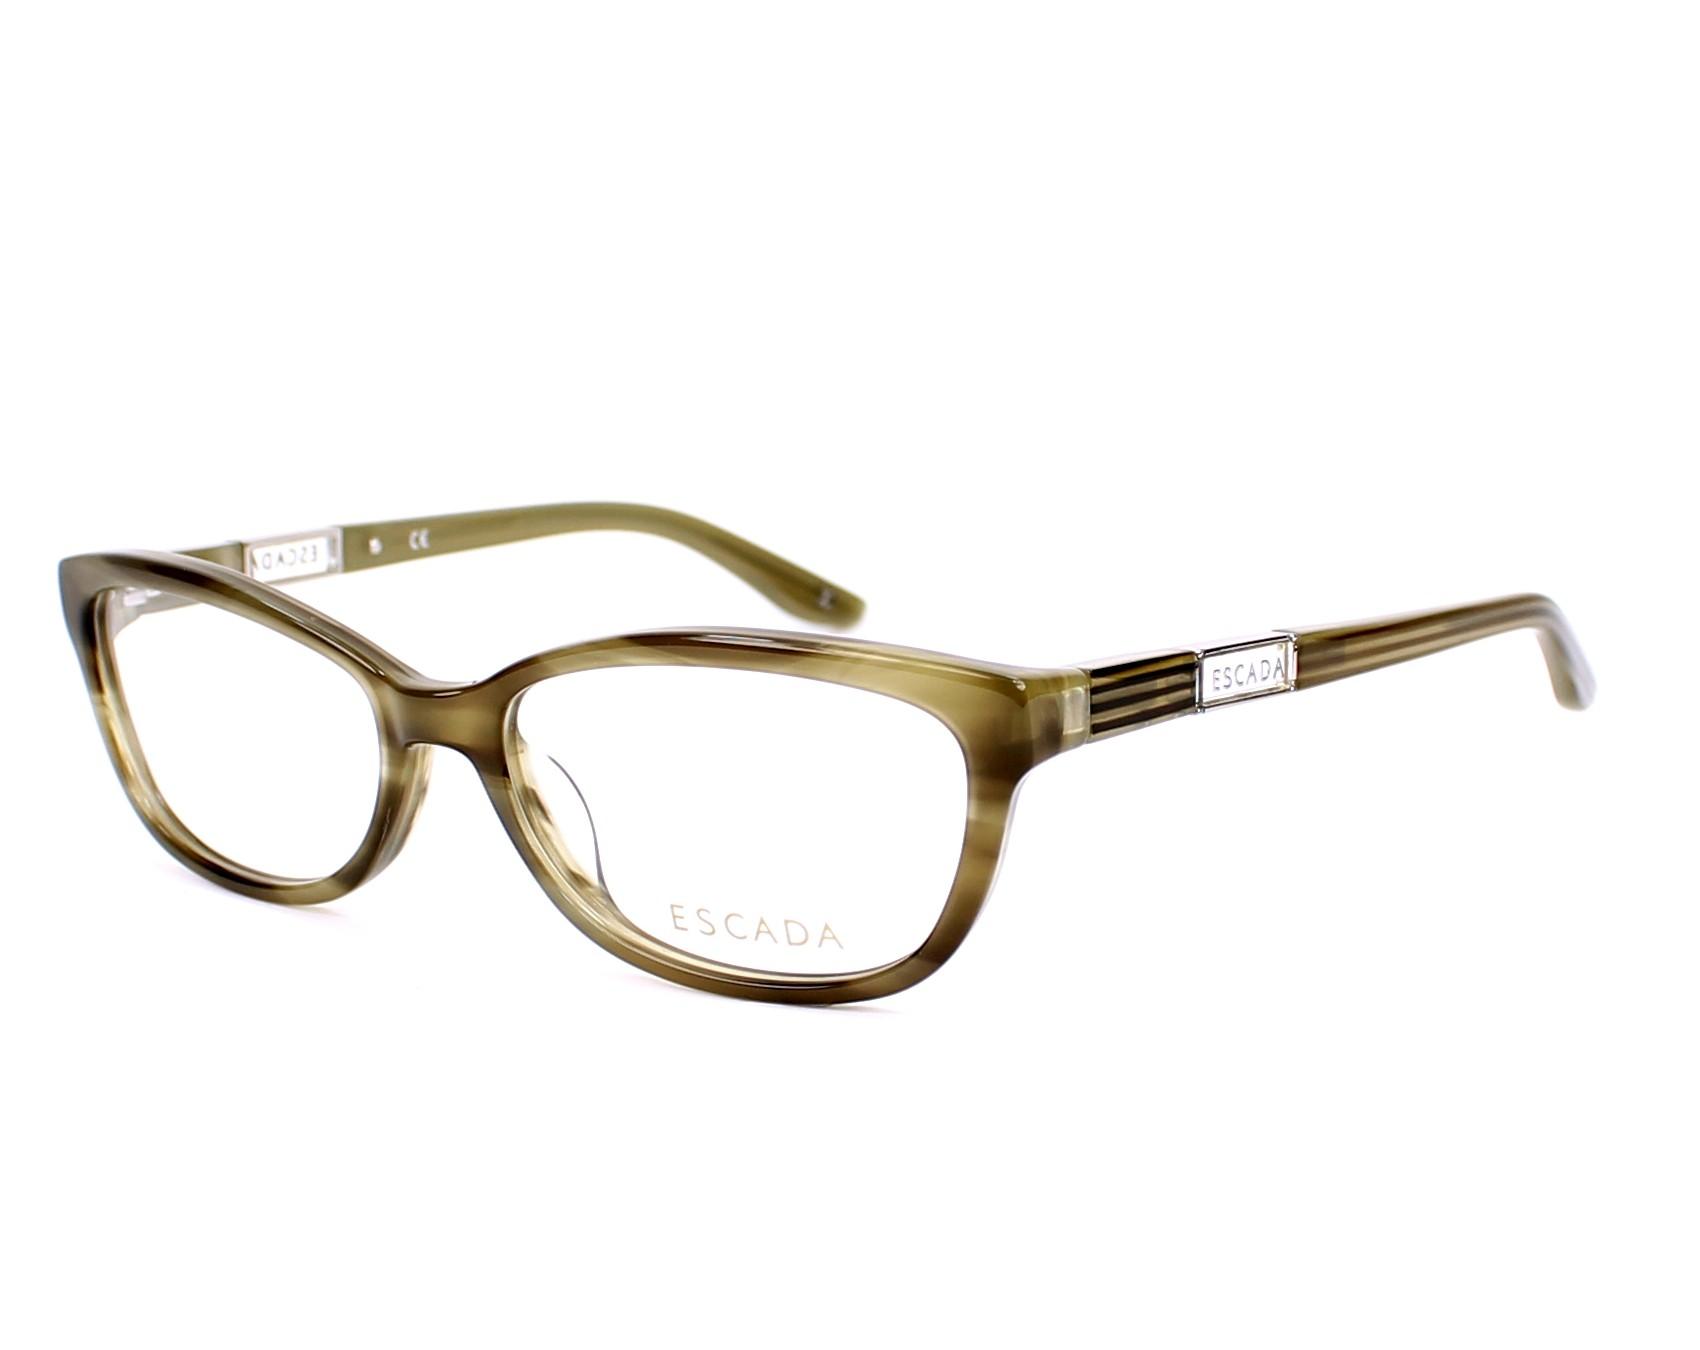 Glasses Frames Escada : Order your Escada eyeglasses VES300 0P90 53 today